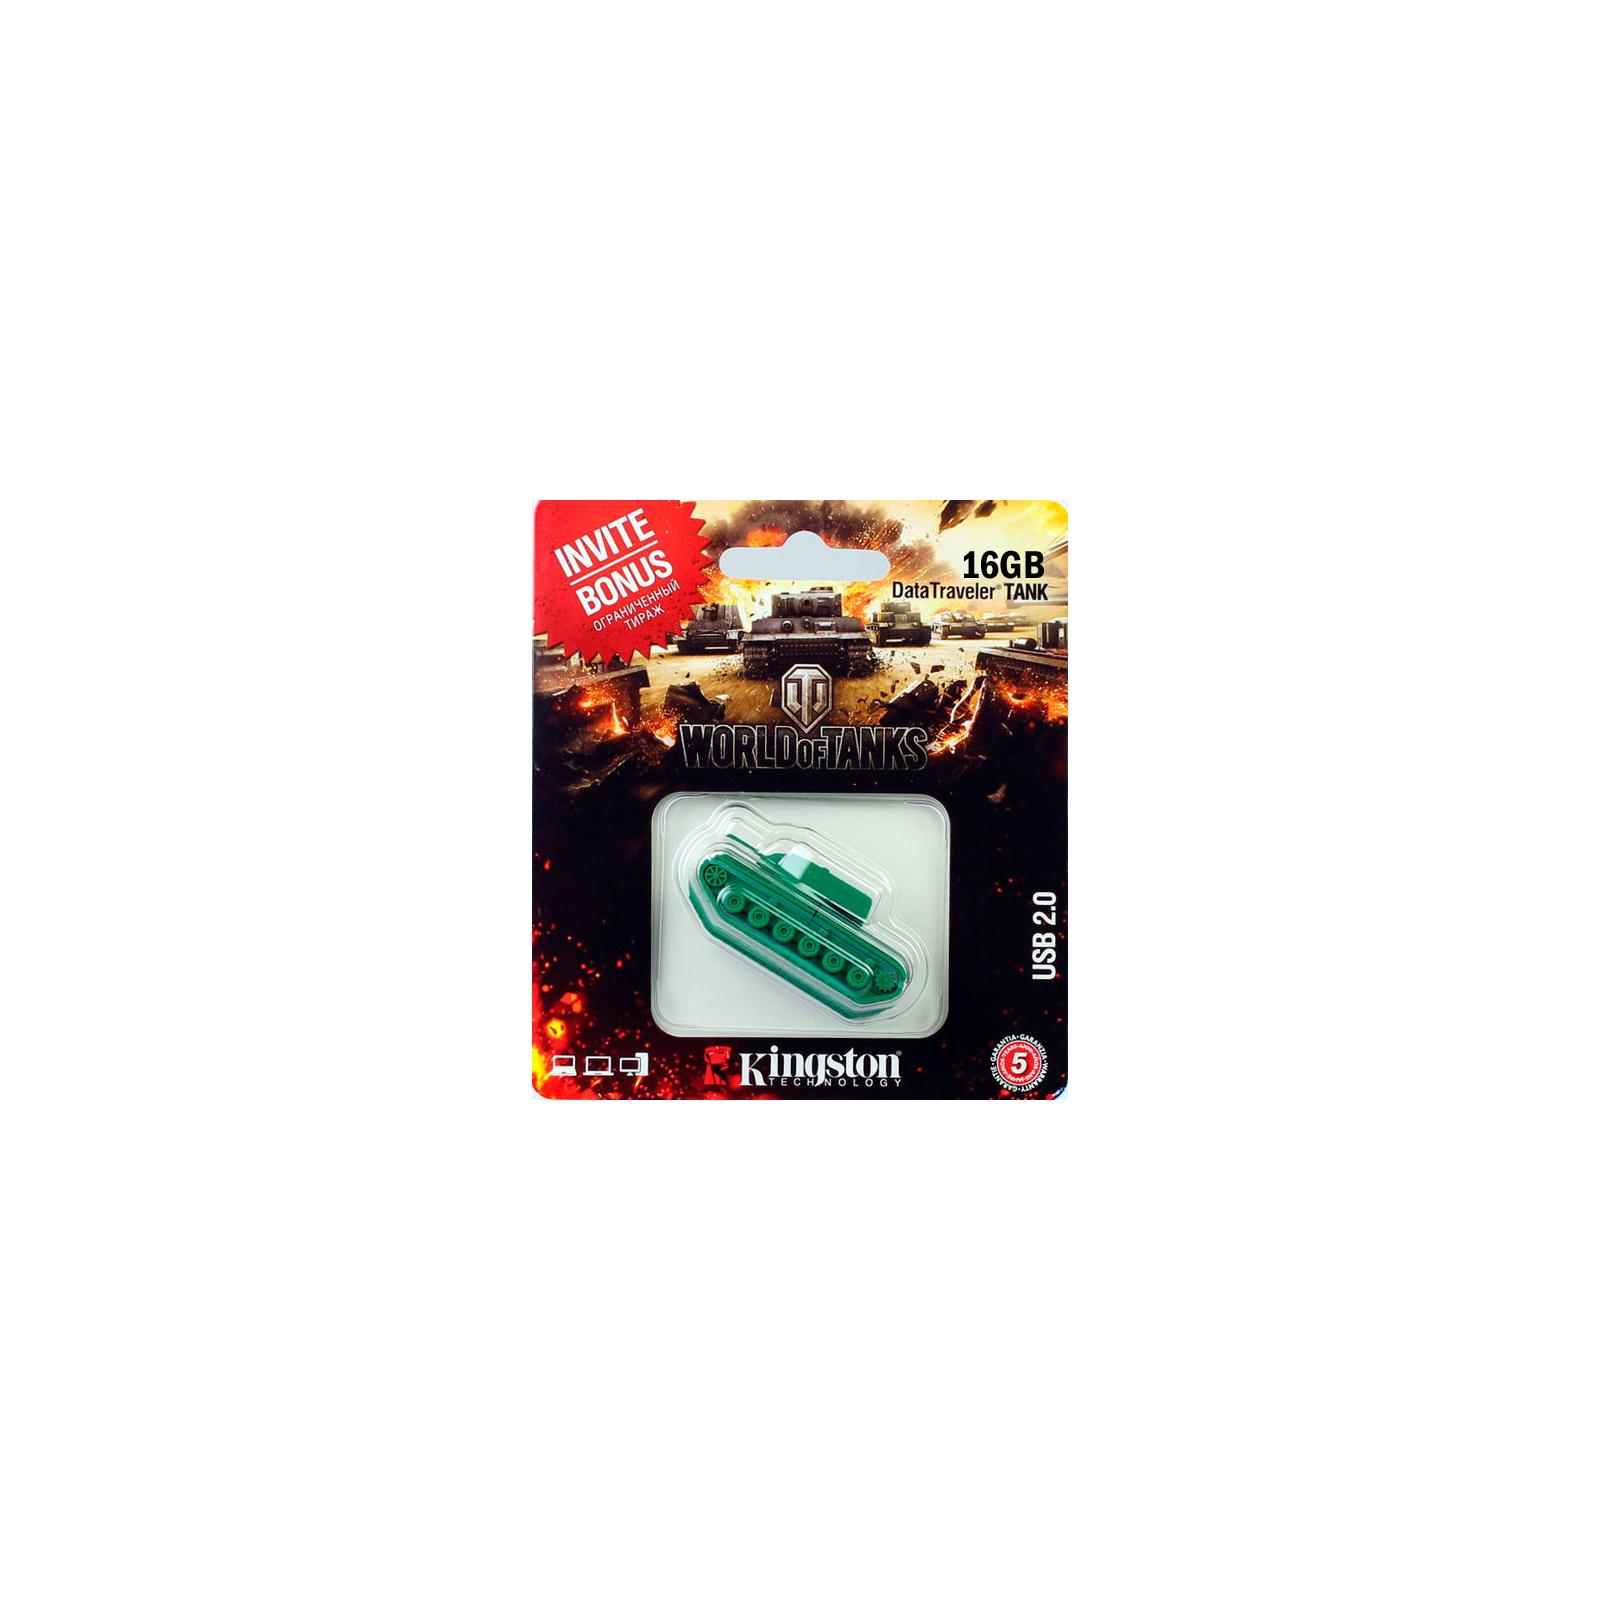 USB флеш накопитель Kingston 16 GB Custom Rubber Tank (DT-TANK/16GB)